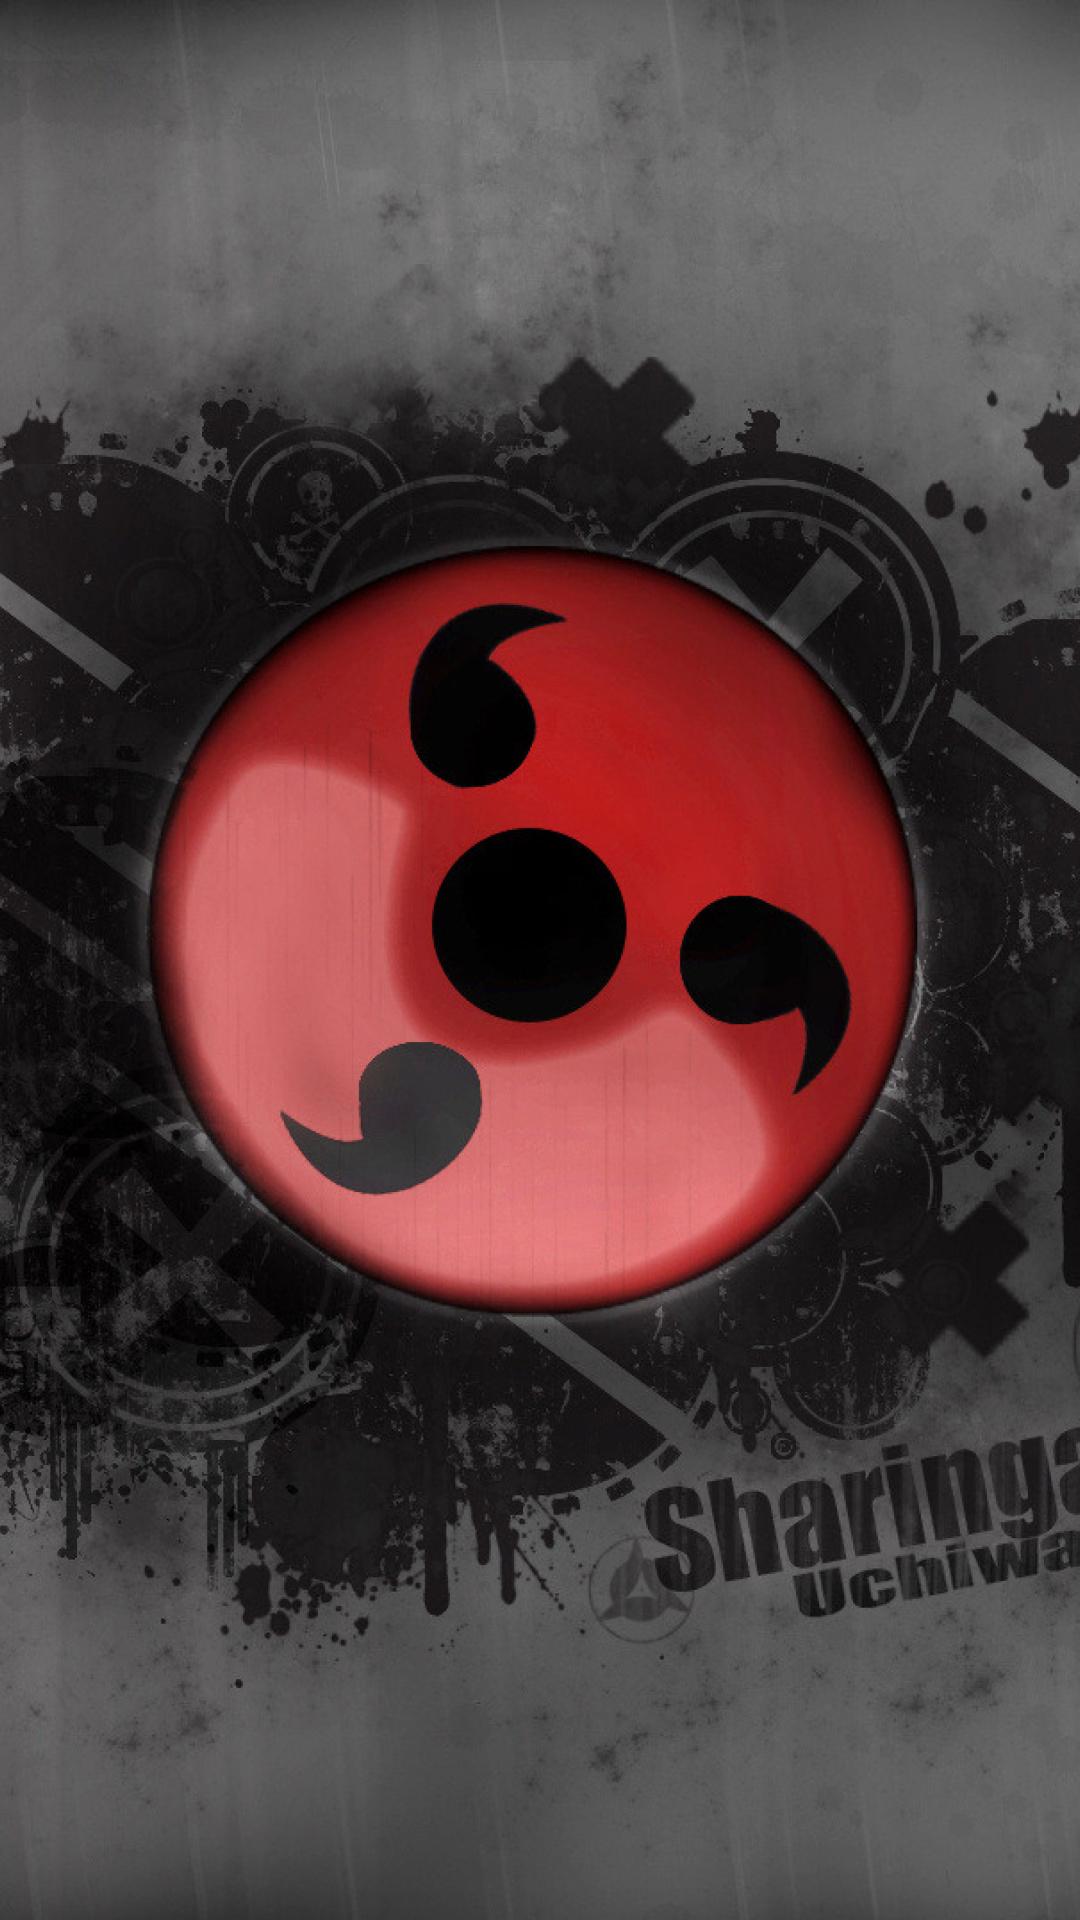 Panda Anime Wallpaper Sharingan Image Id 11048 Image Abyss